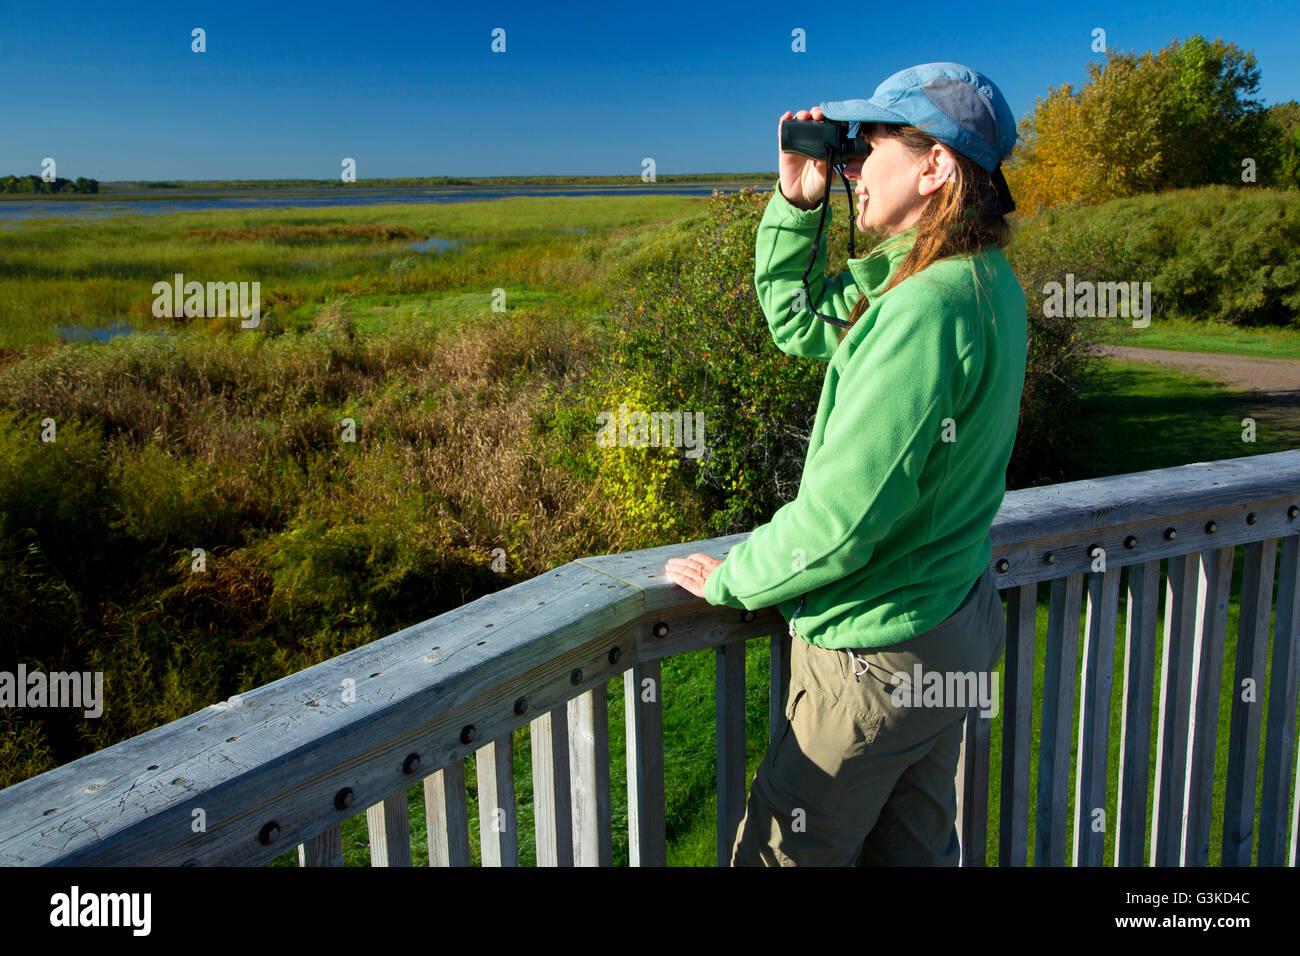 ee7c8c74d73 Rice Lake Observation Tower